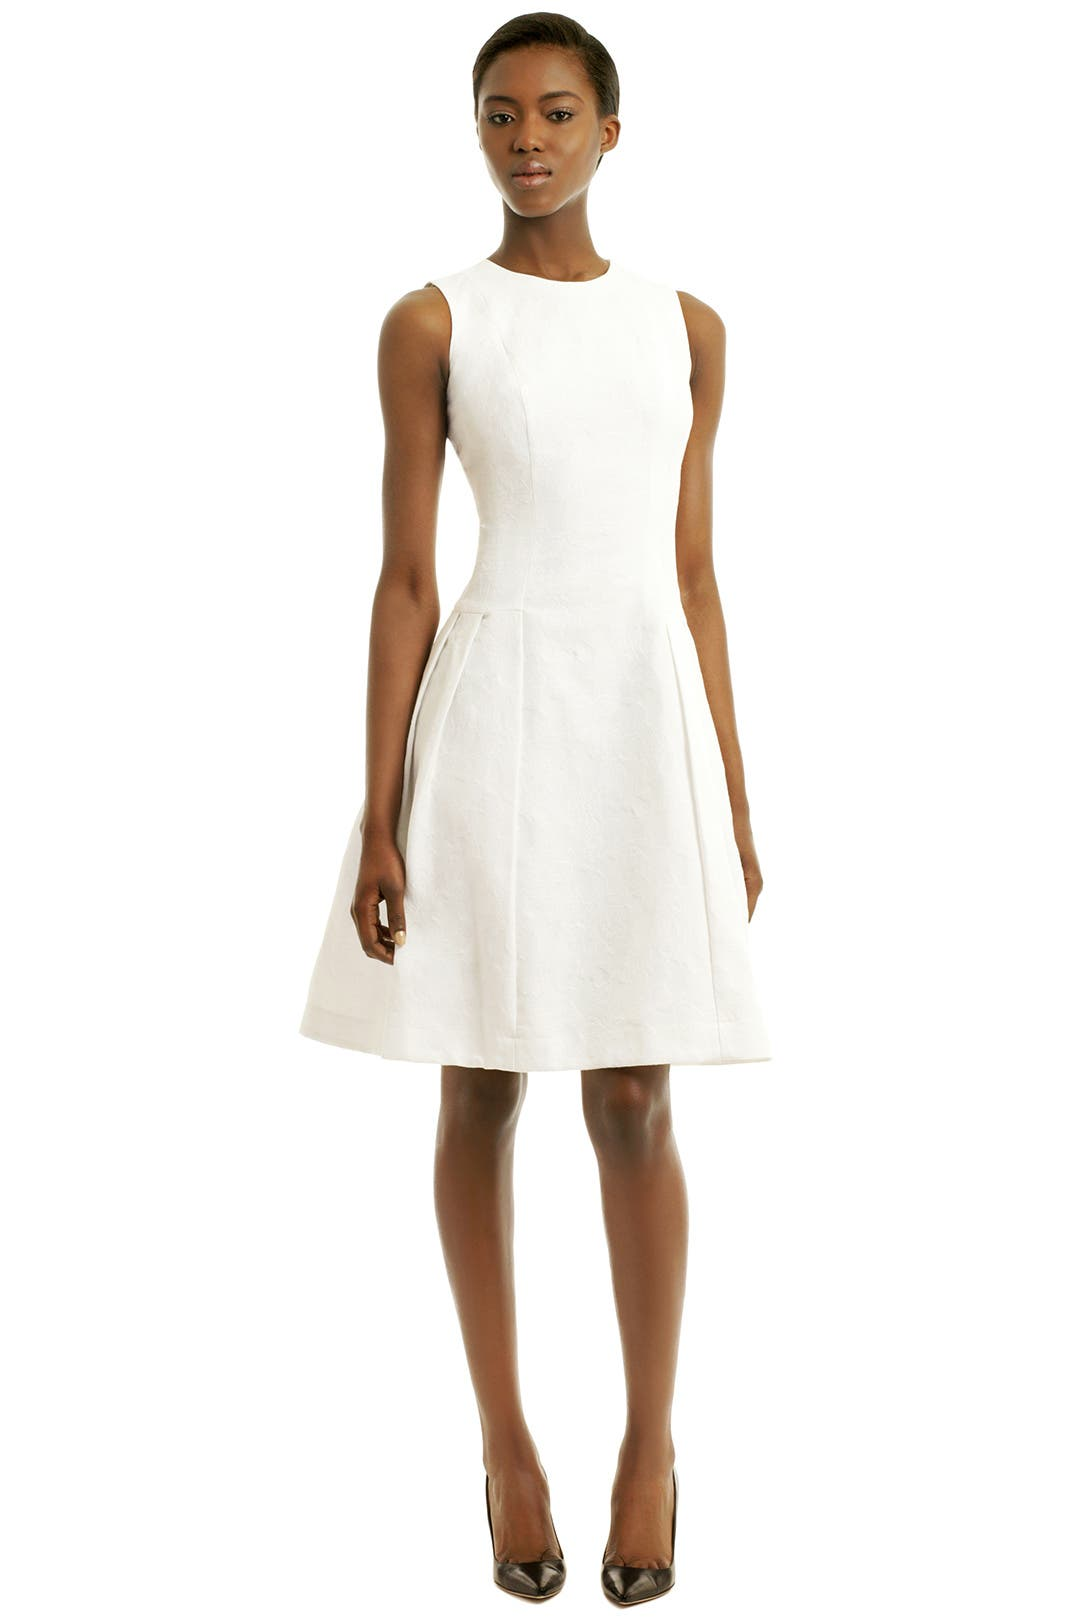 White Halo Dress by Carmen Marc Valvo